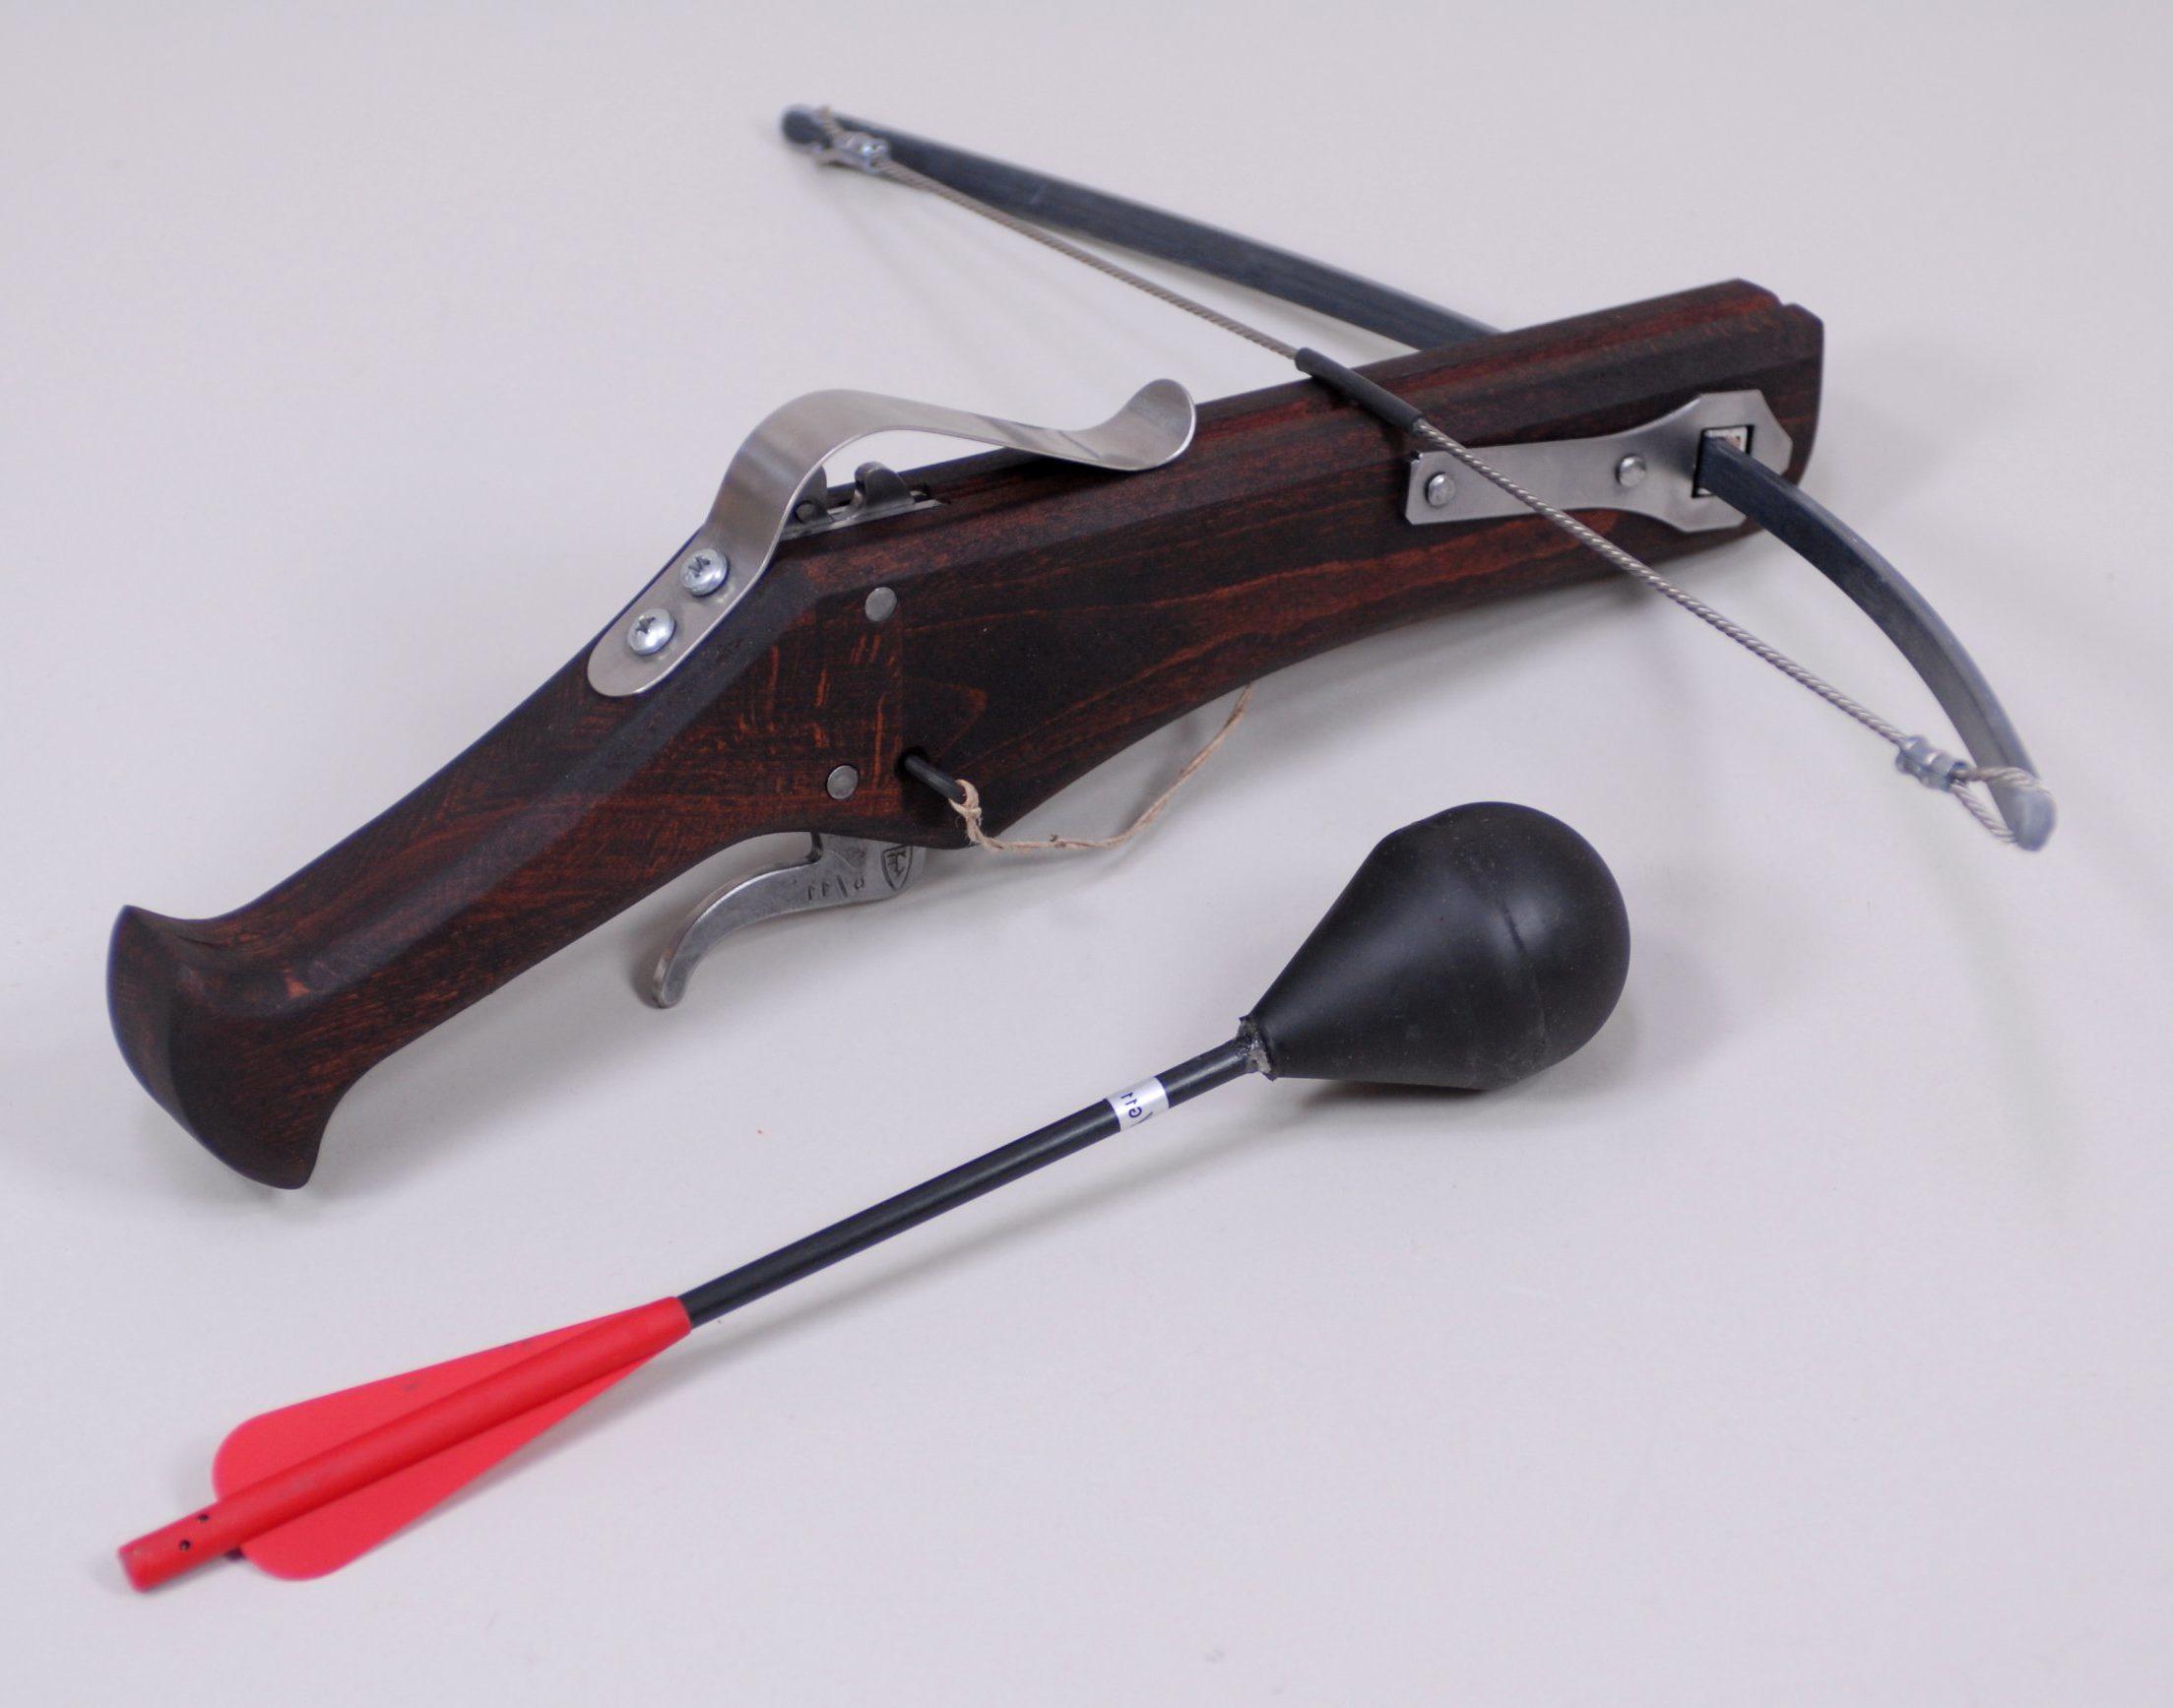 Pistolenarmbrust mit Sicherheitsbolzen daneben